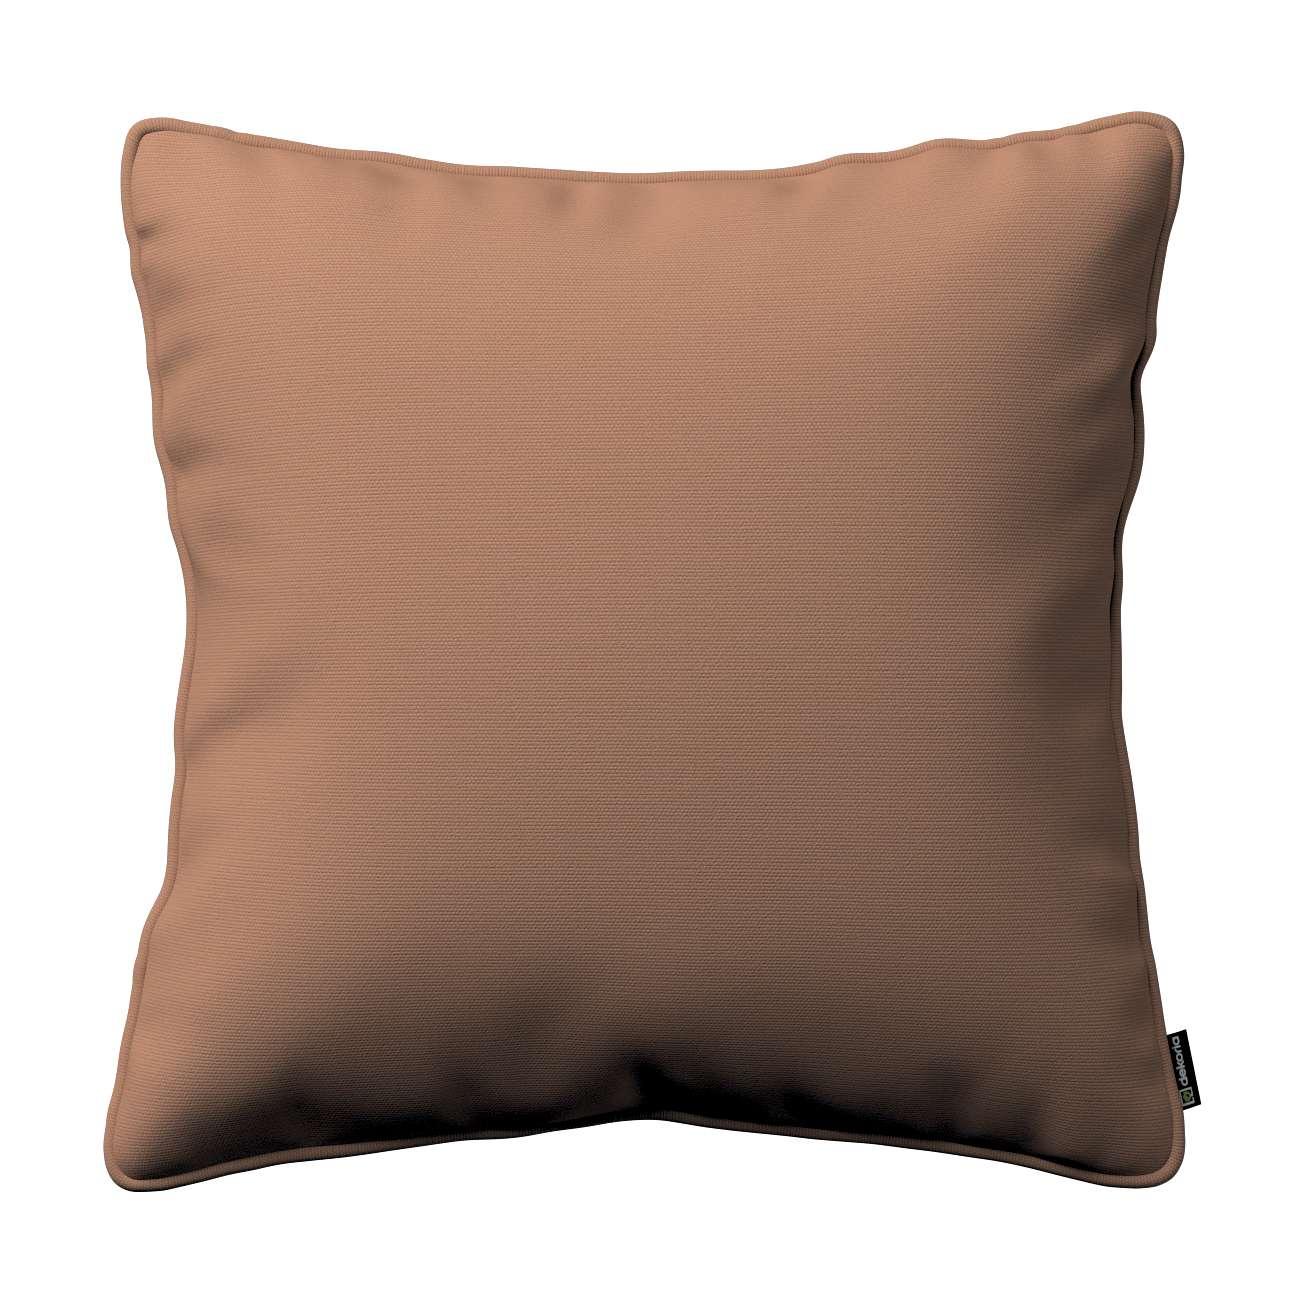 Kissenhülle Gabi mit Paspel 45 x 45 cm von der Kollektion Cotton Panama, Stoff: 702-02